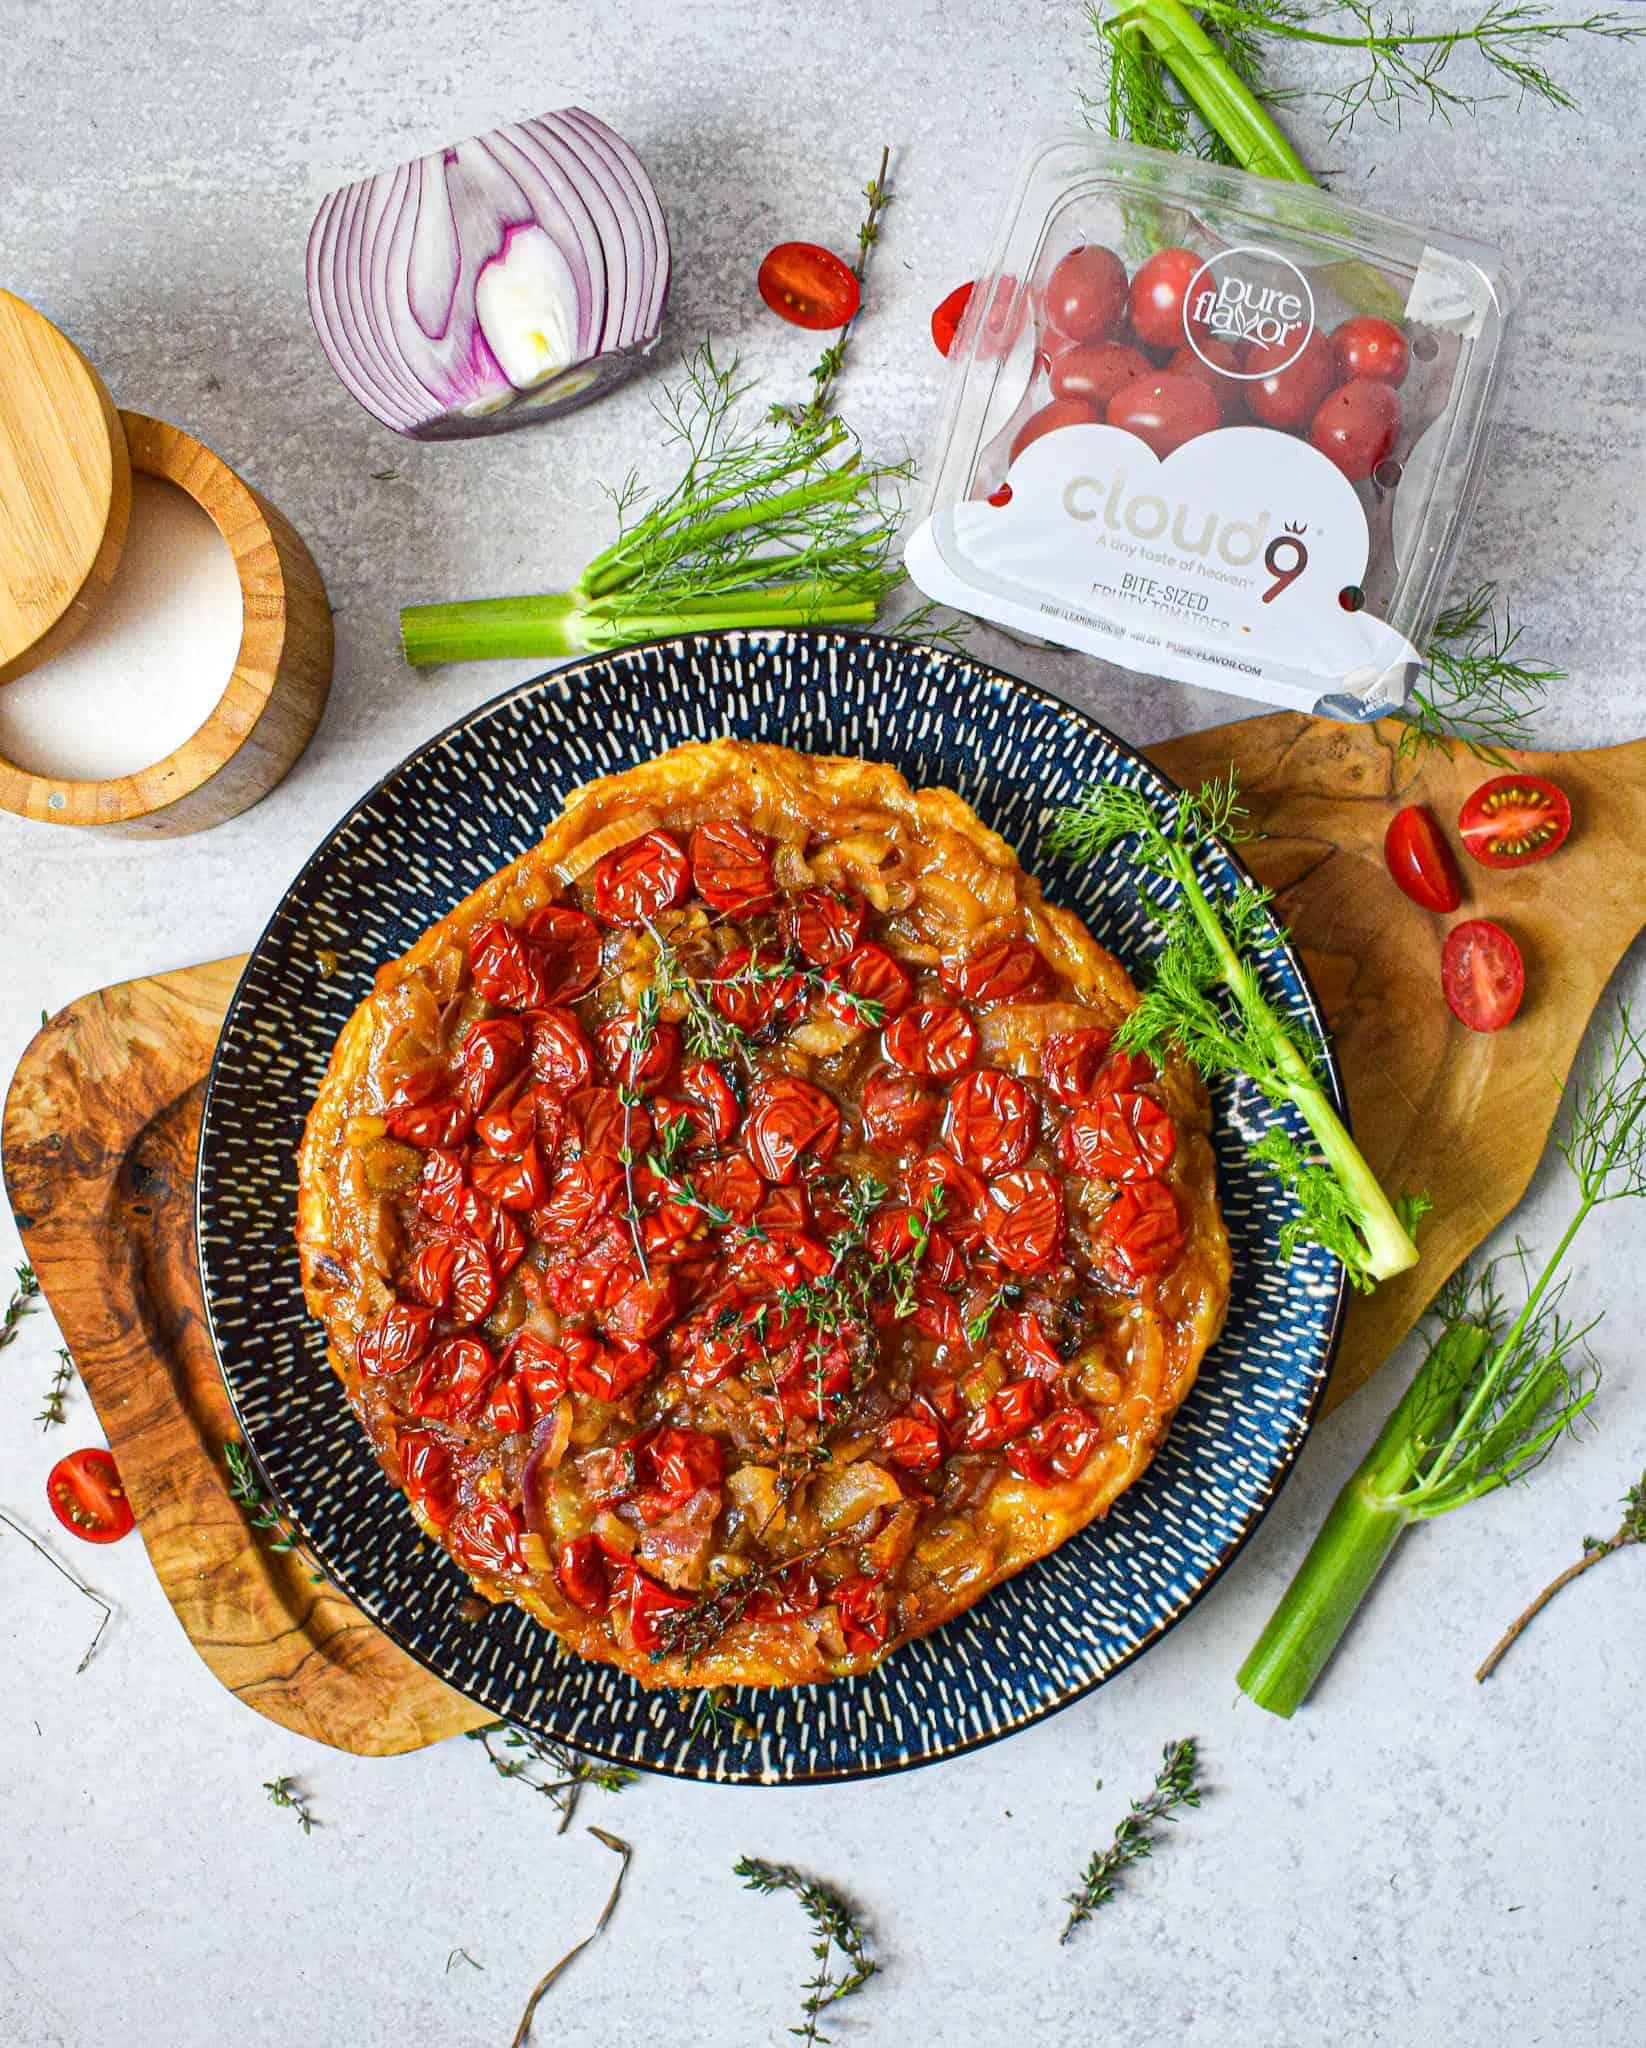 tomato tarte tatin recipe